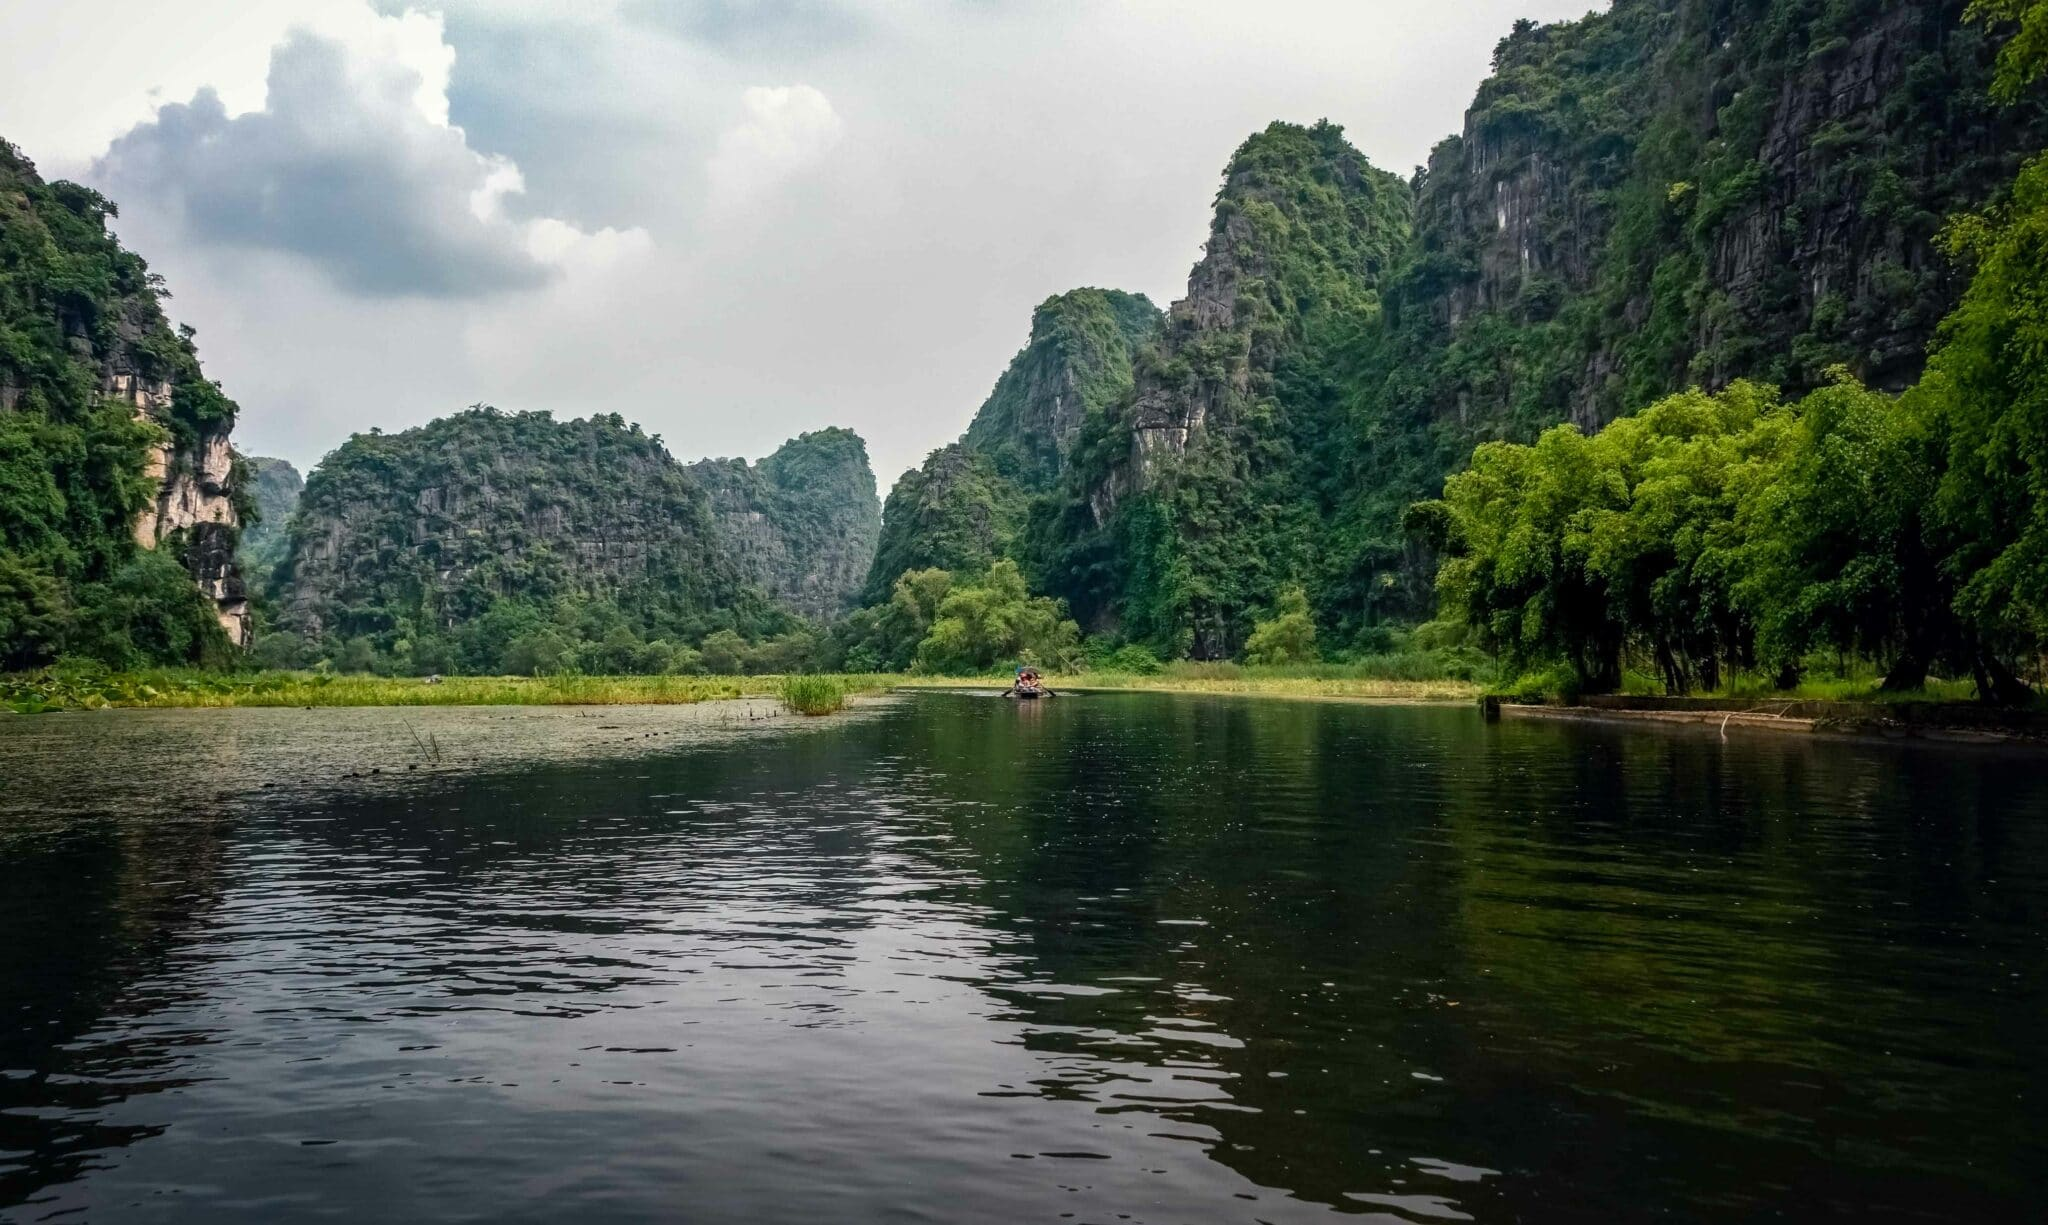 Ngo Dong River Cuc Phuong National Park Vietnam